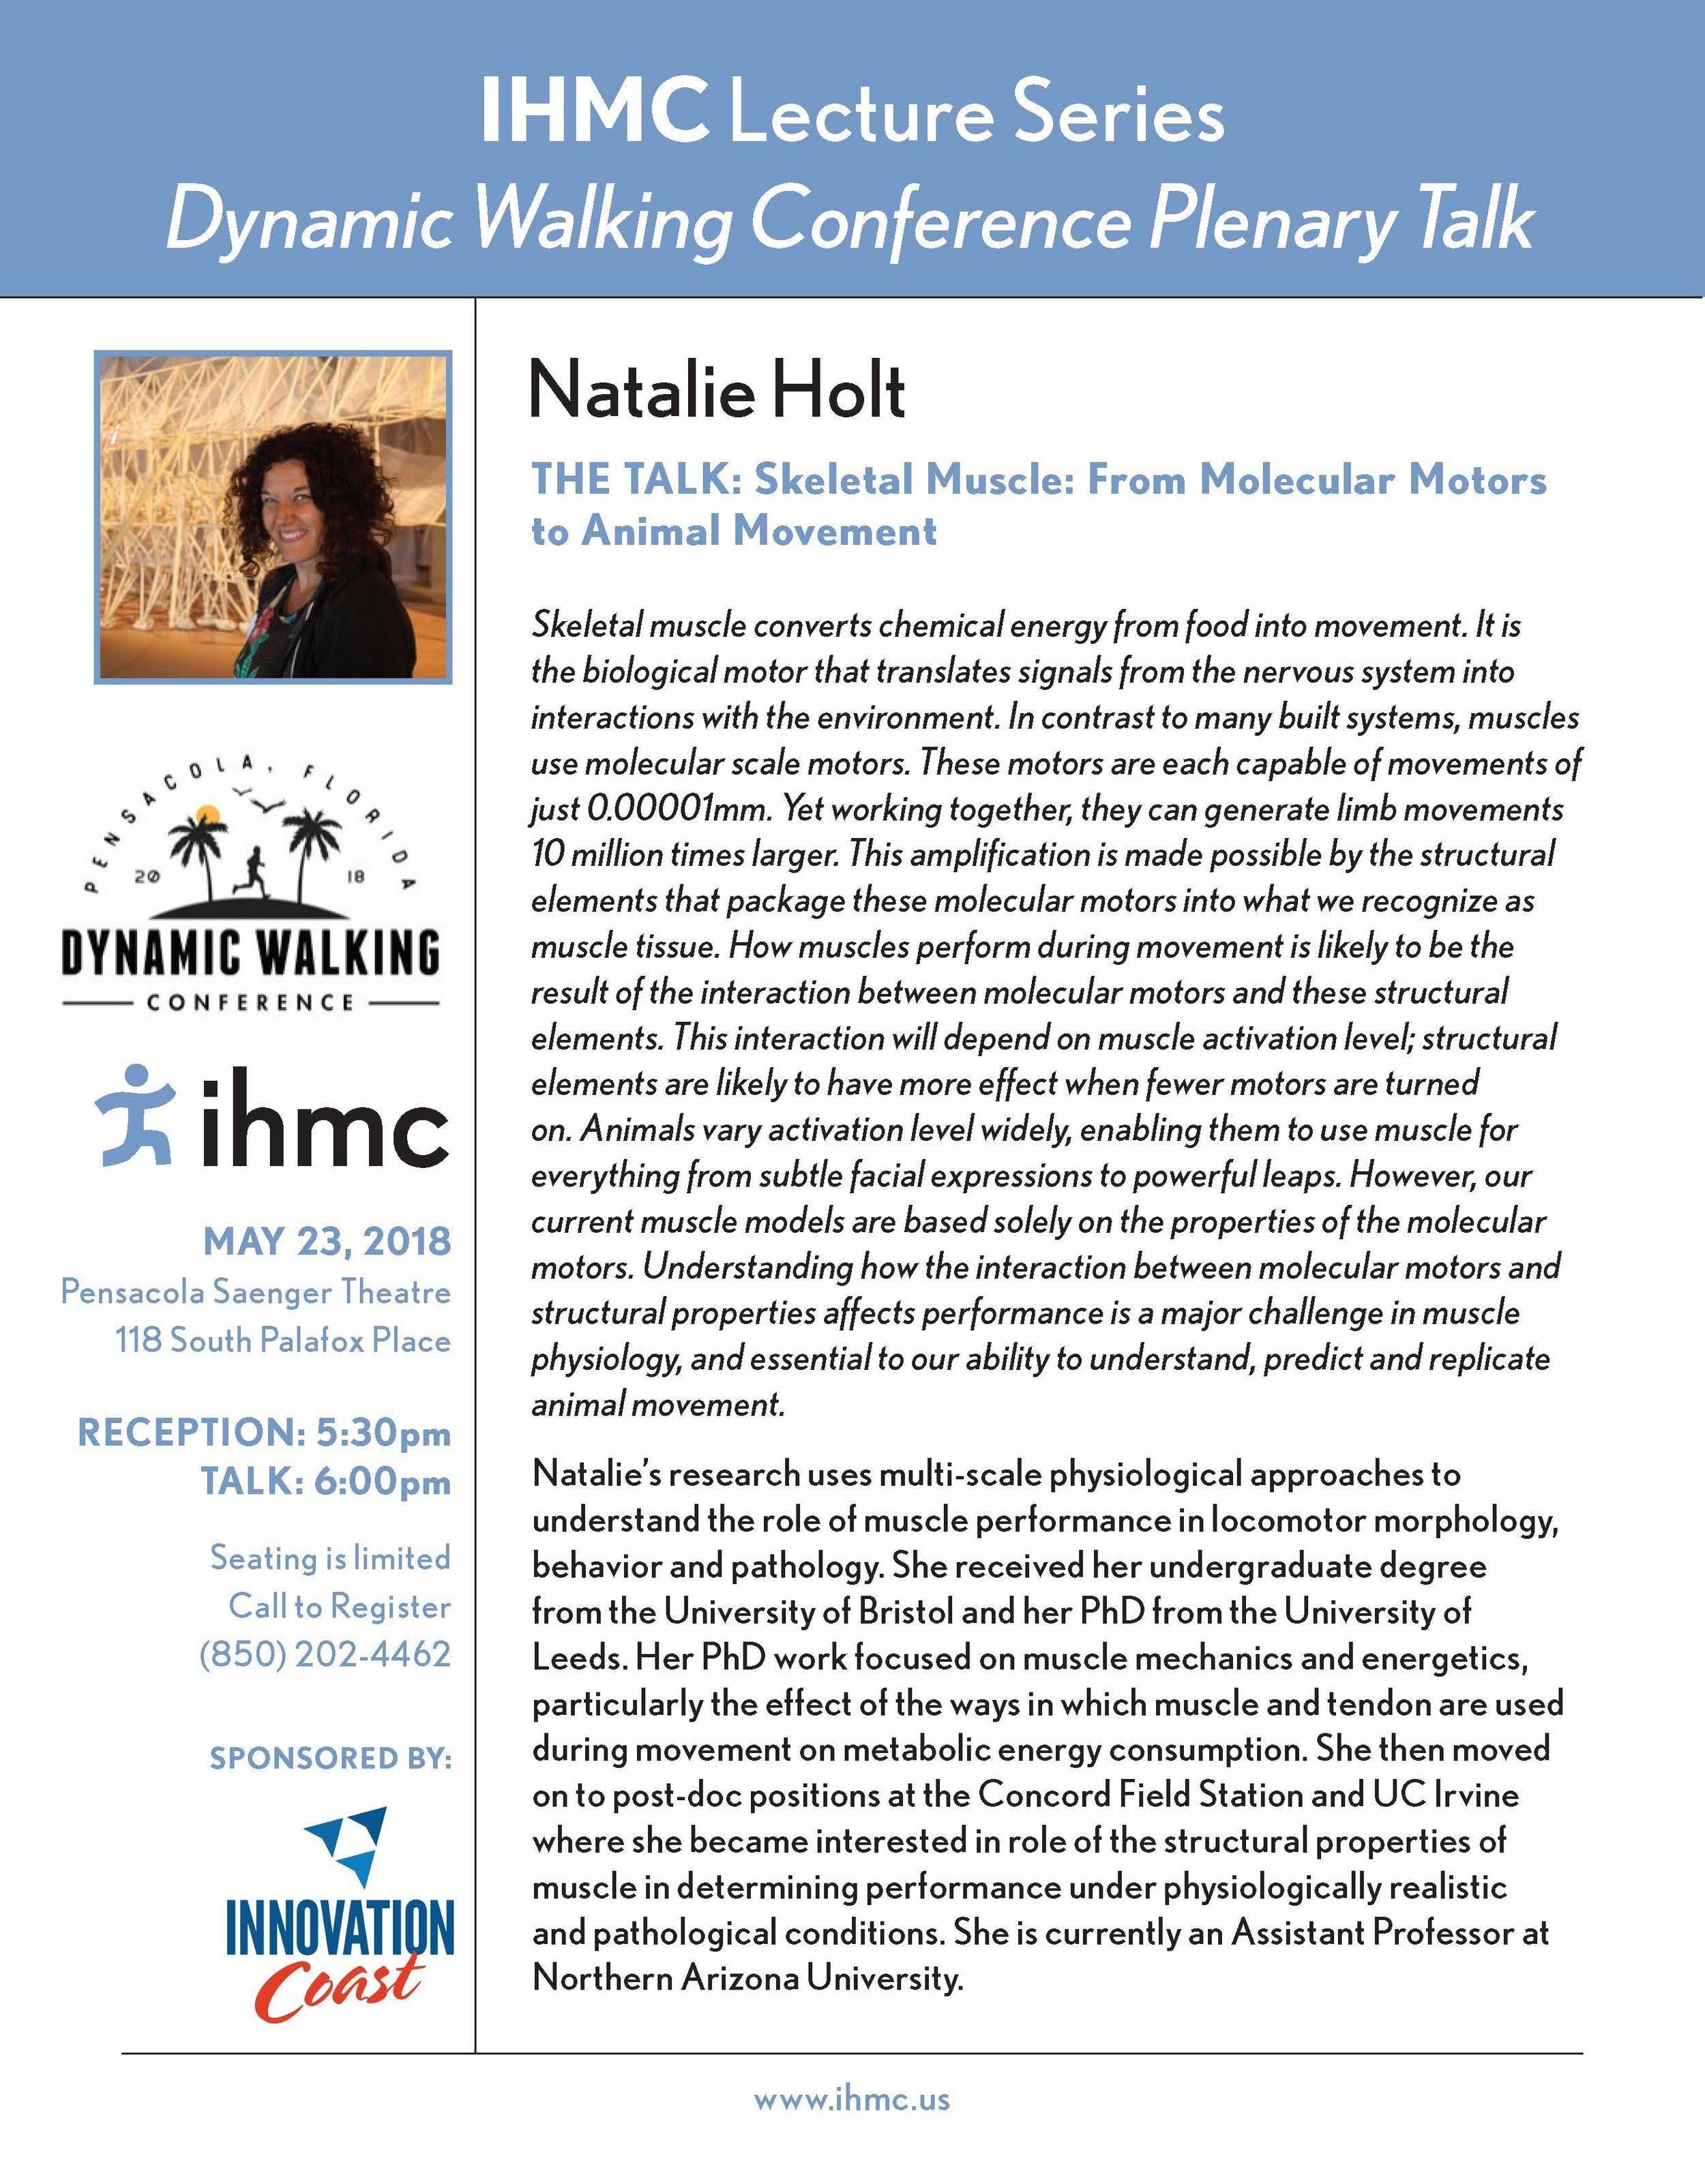 IHMC-Lecture-dynamicwalking-2018.jpg